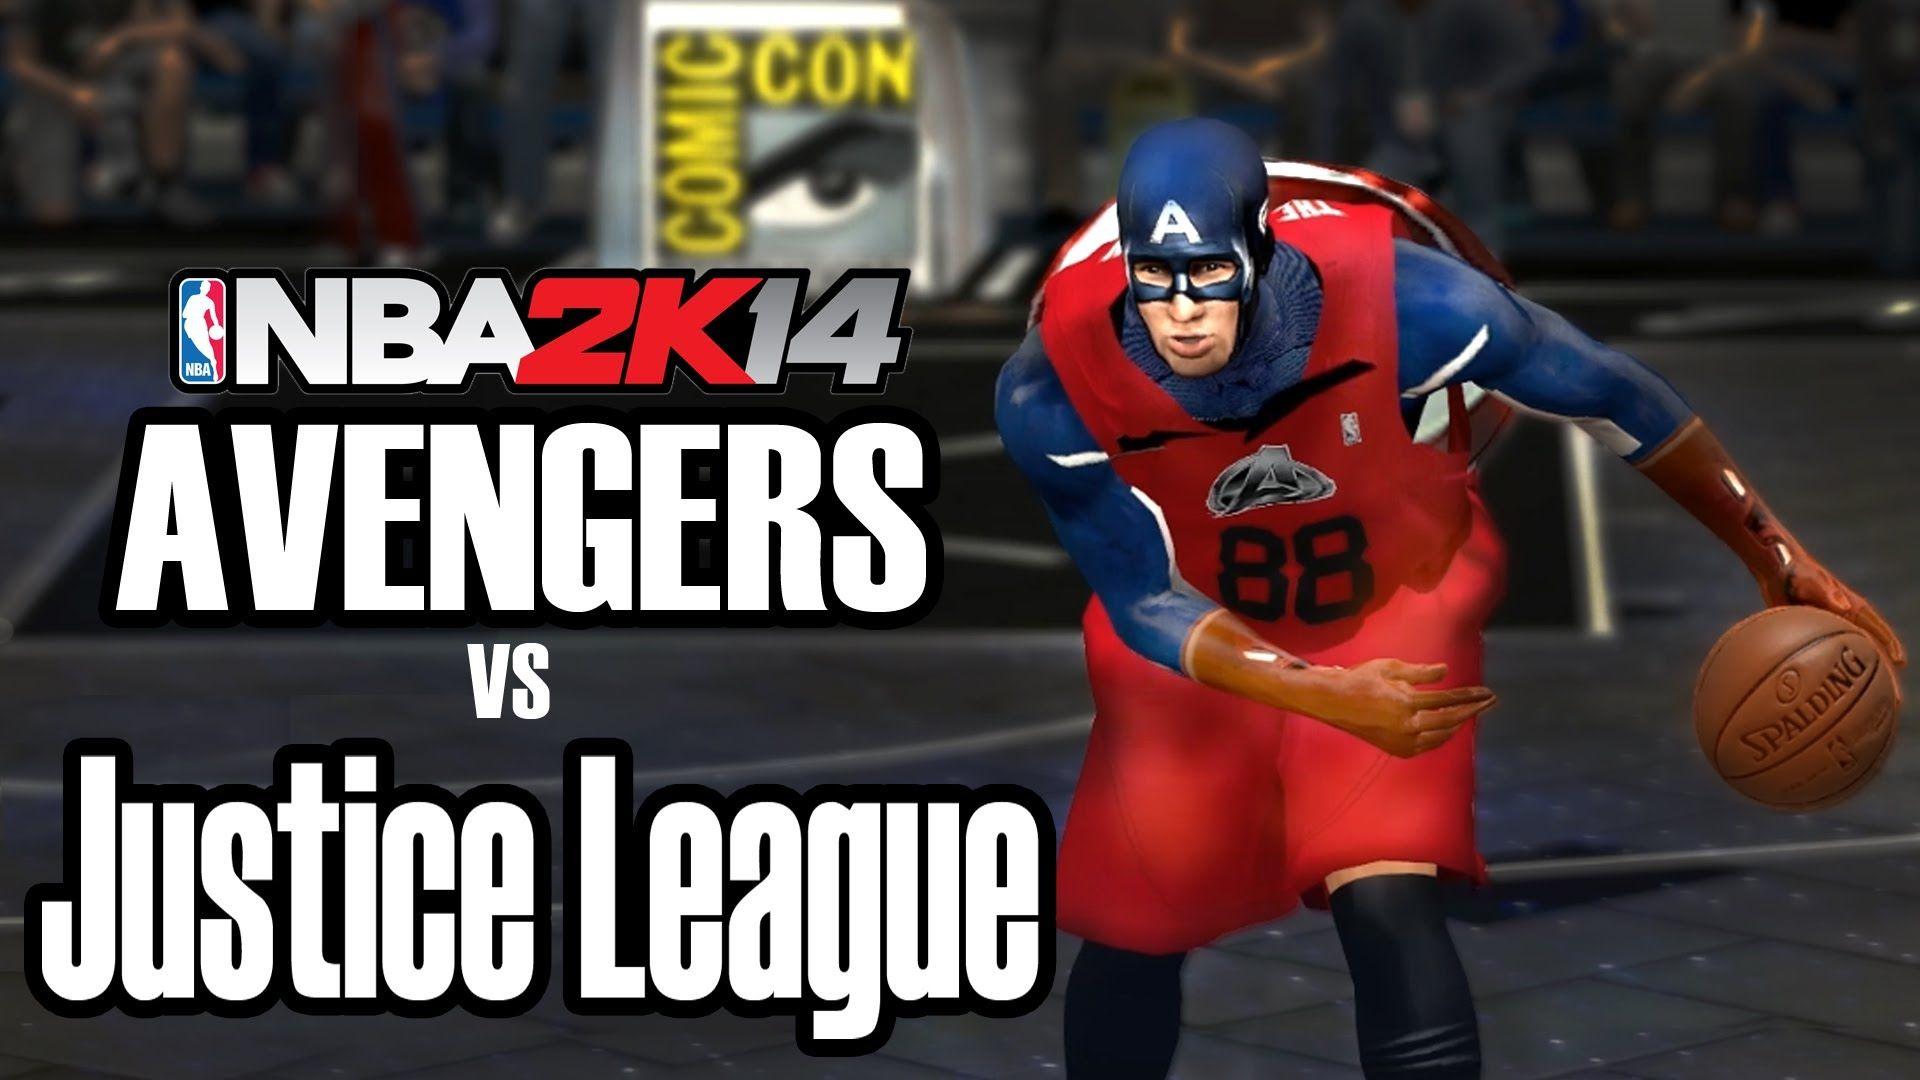 Avengers Vs Justice League Nba 2k14 Mod Hd Download Justice League Avengers League